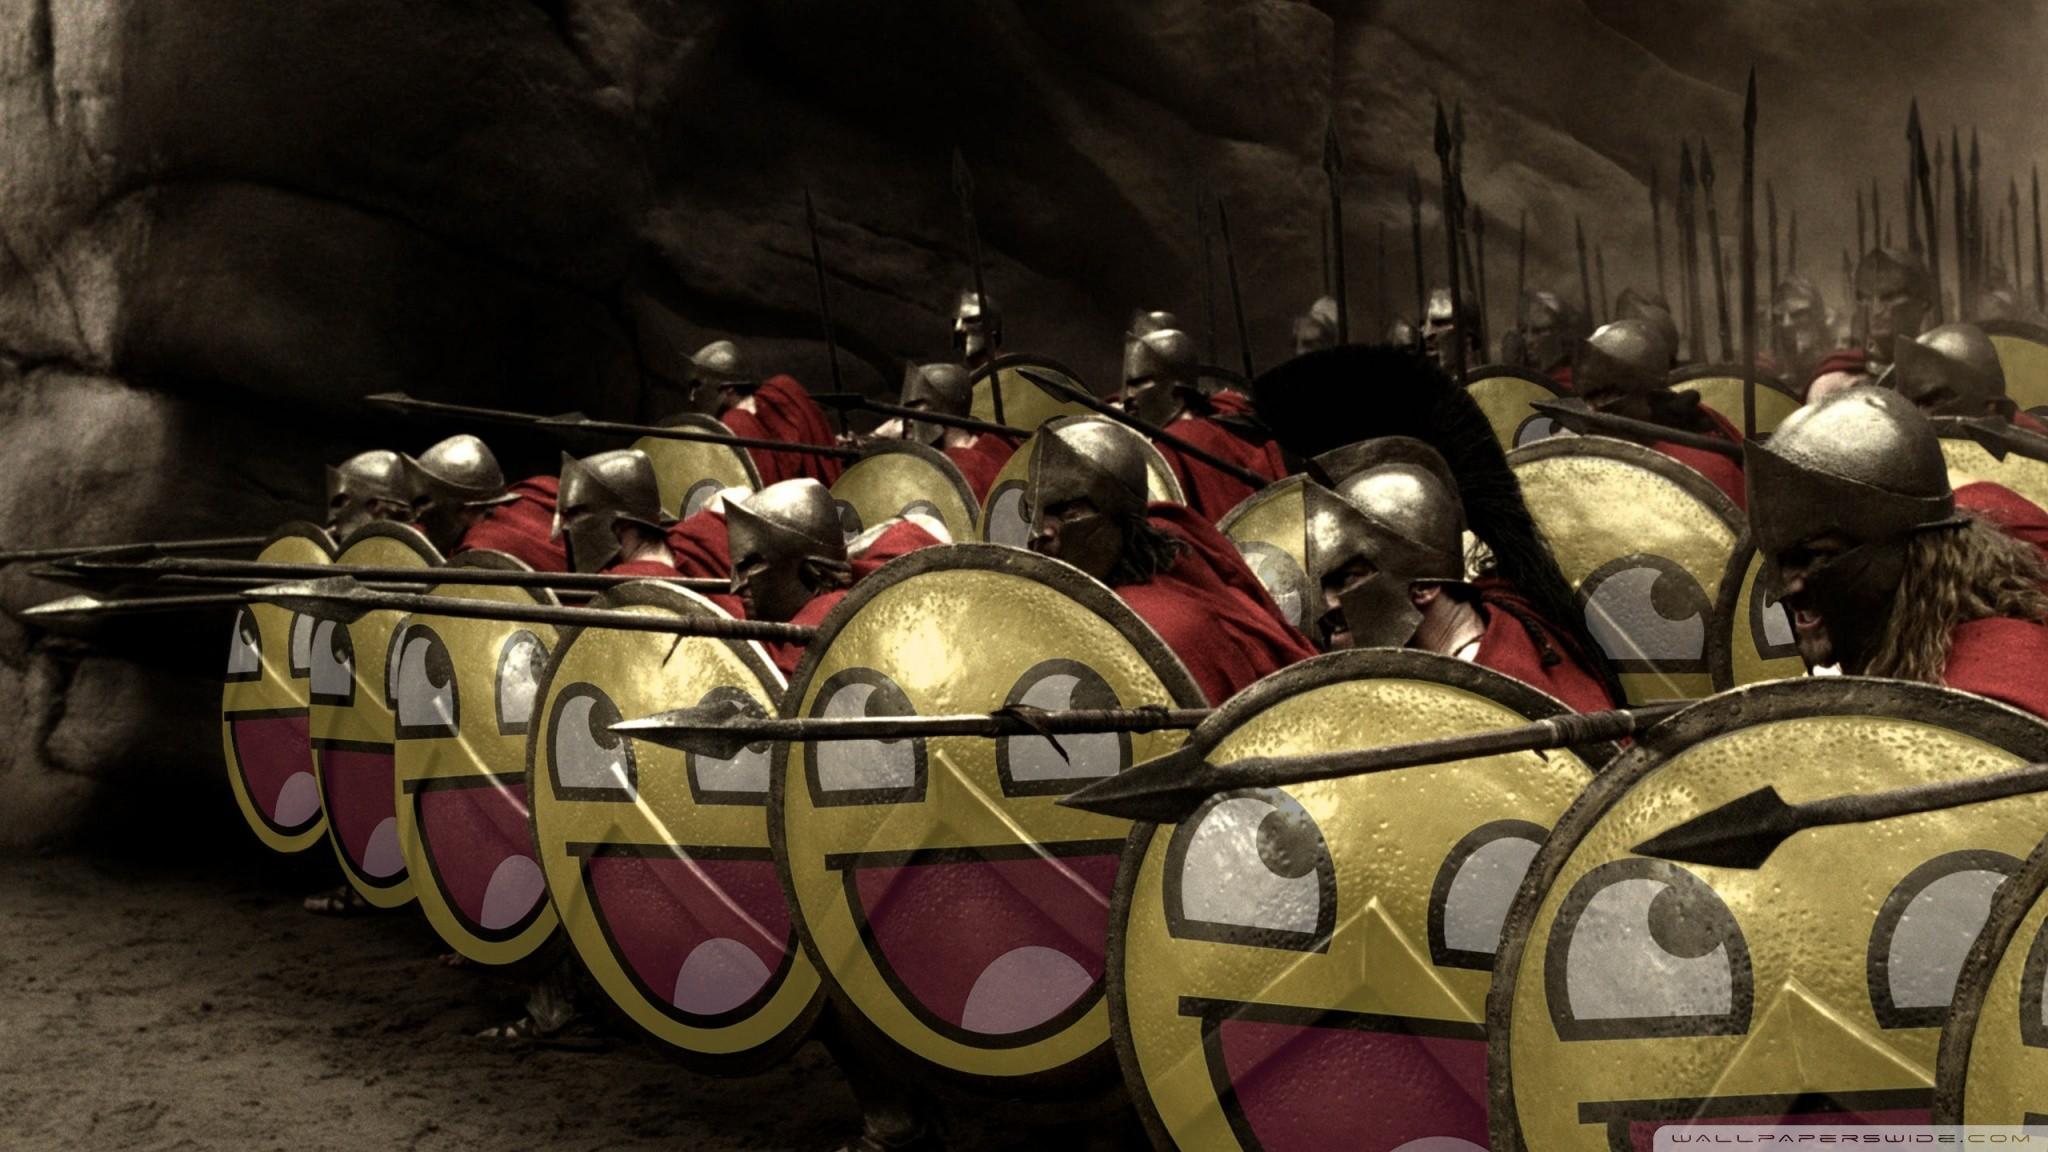 … the 300 spartans hd desktop wallpaper high definition mobile; pixel  wallpapers group 83; …